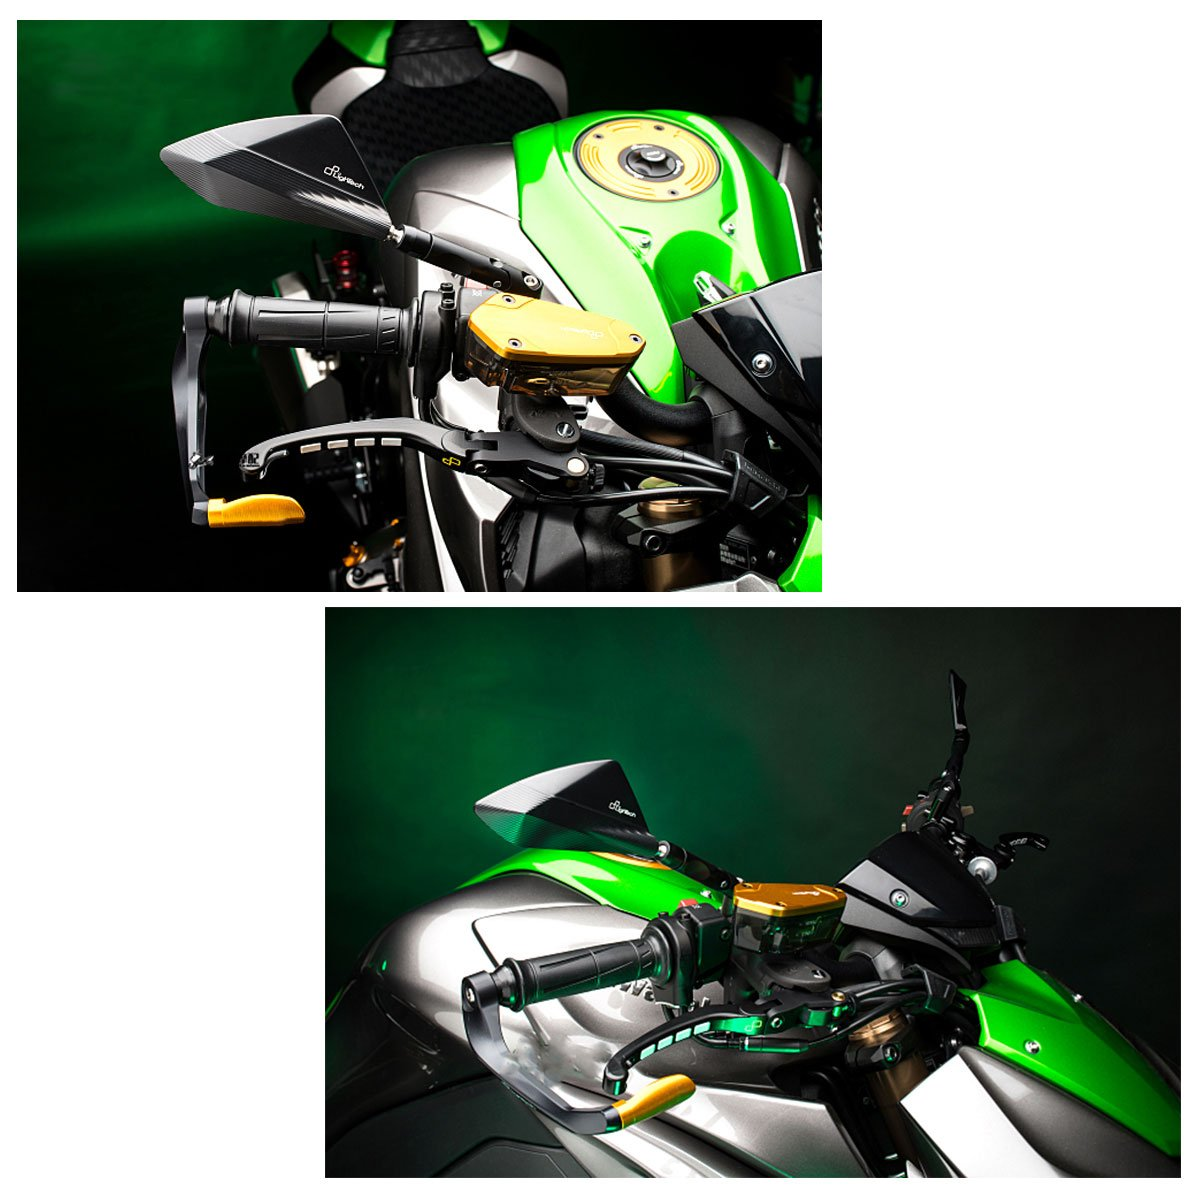 gazechimp 2x Contattore Rel/è Solenoide di Investimento 500 A UV//ATV Argano 12 V DC